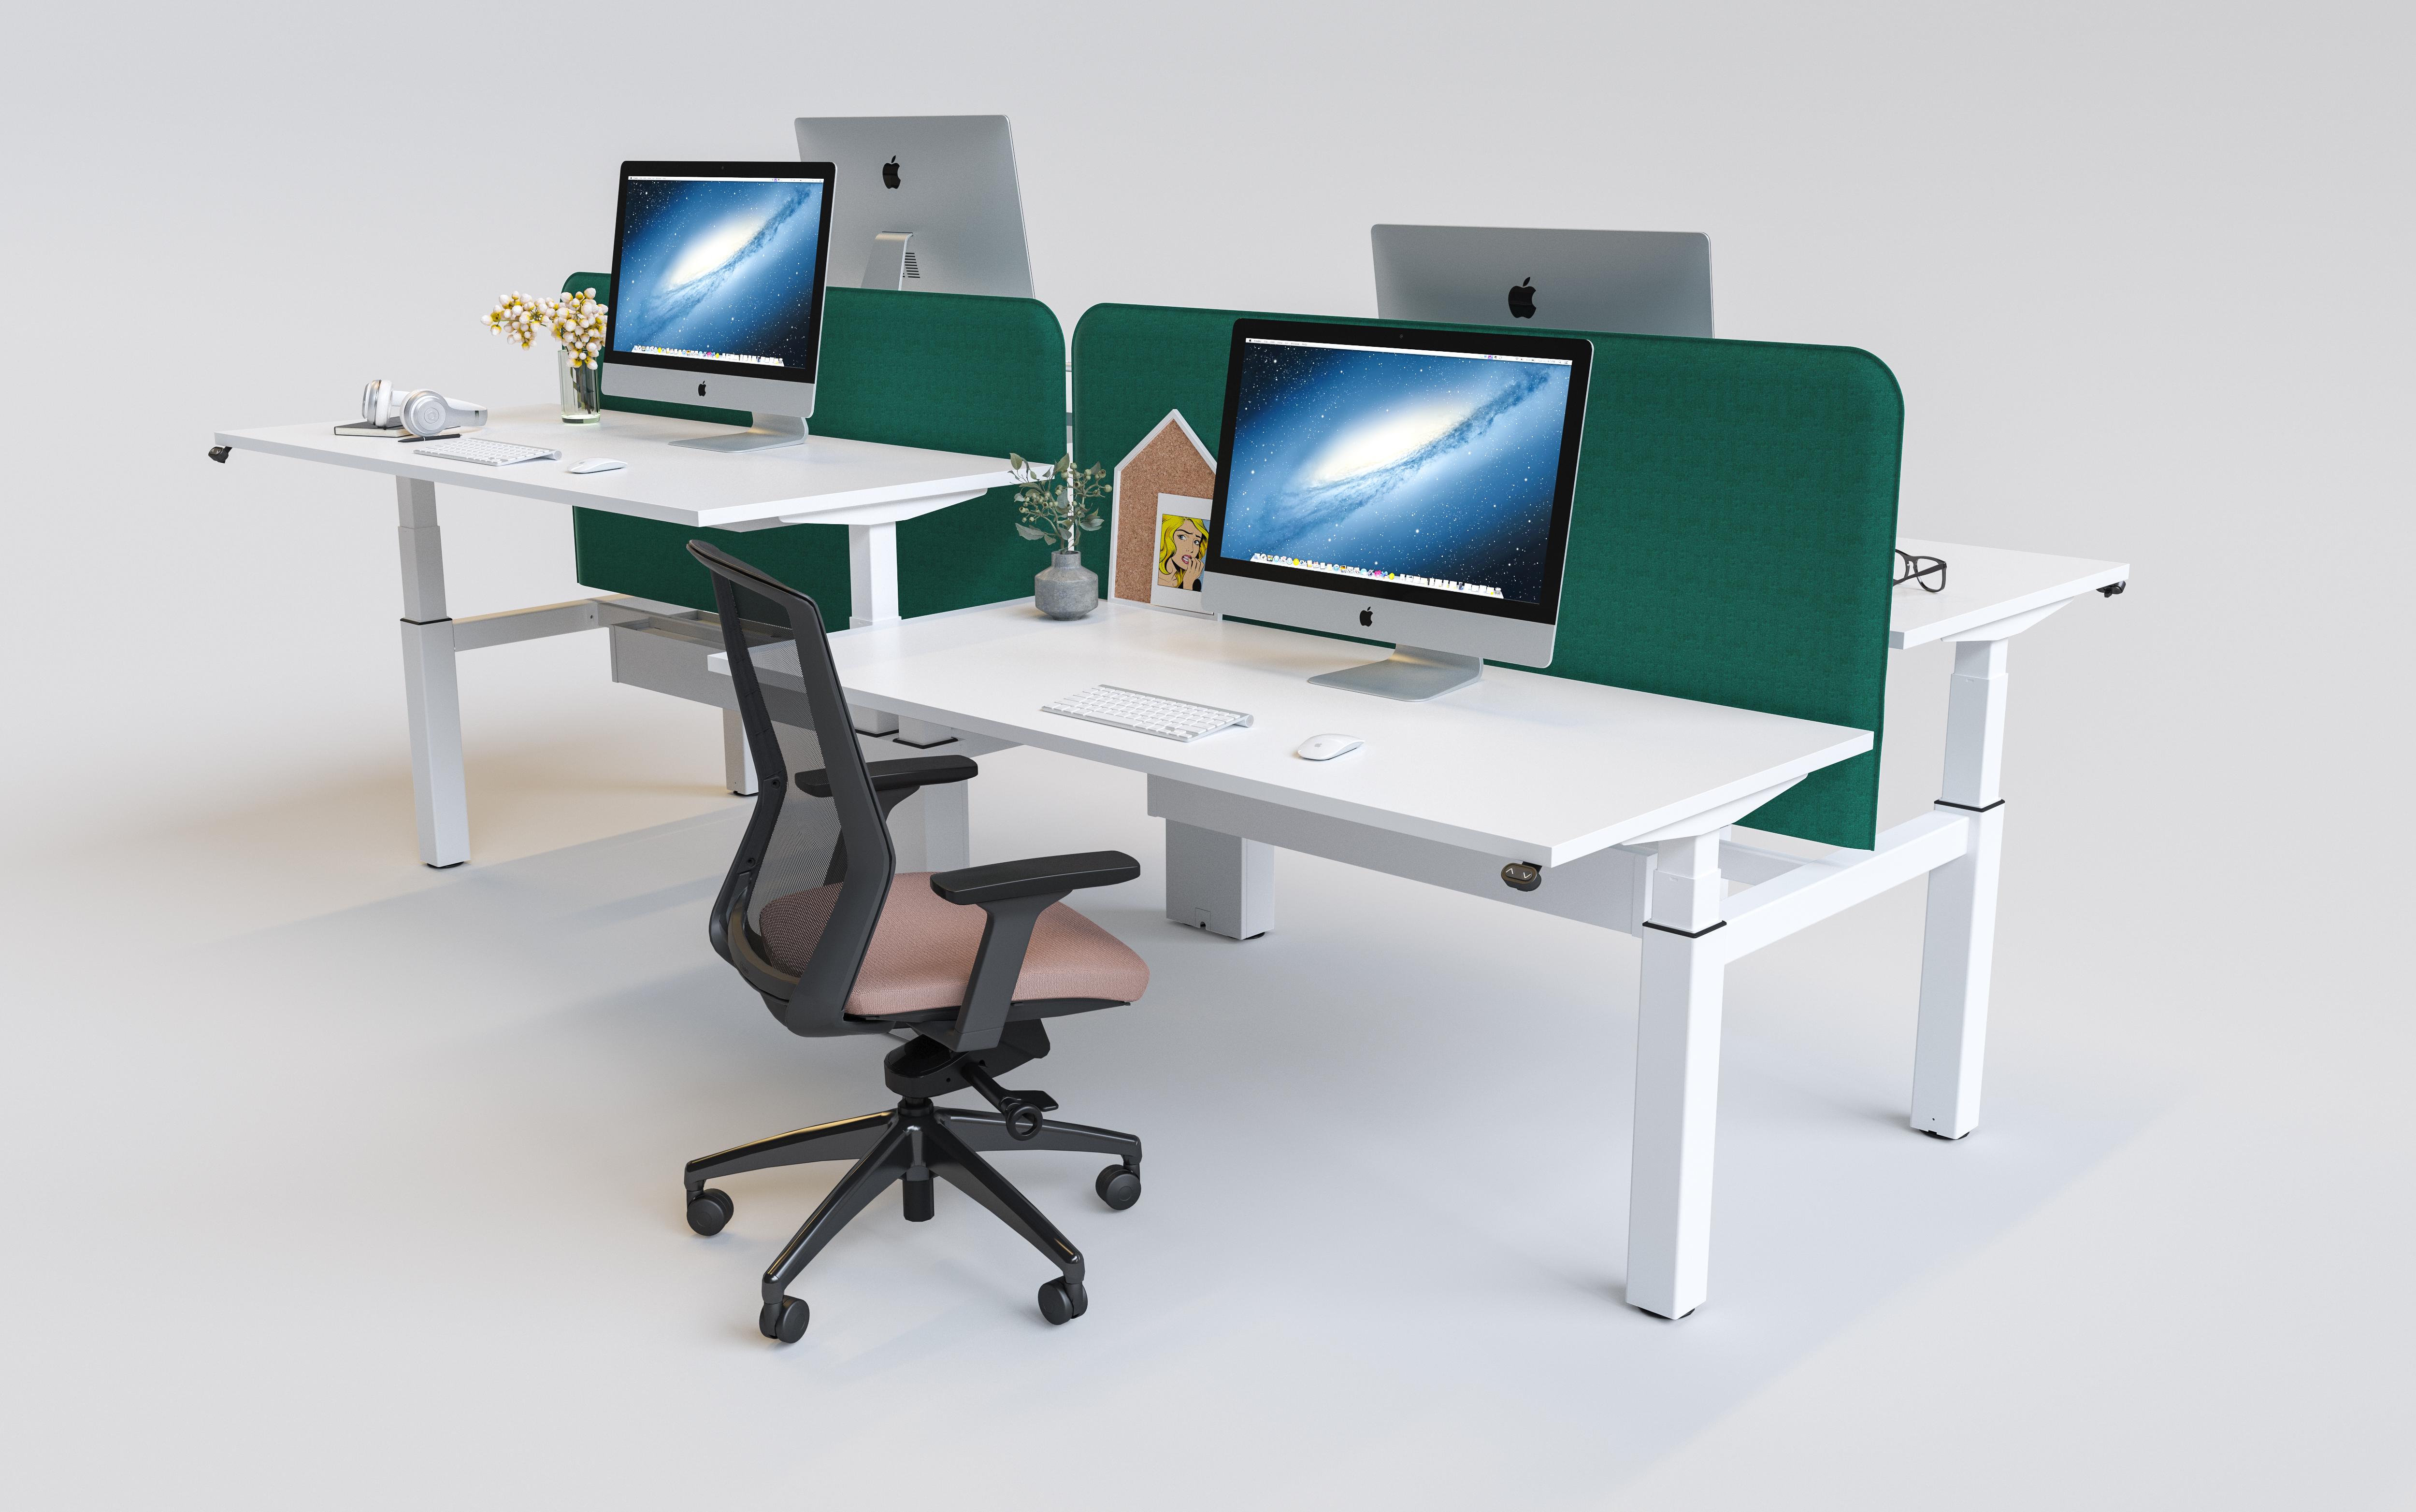 Bench_desk_set-up_Rev_A